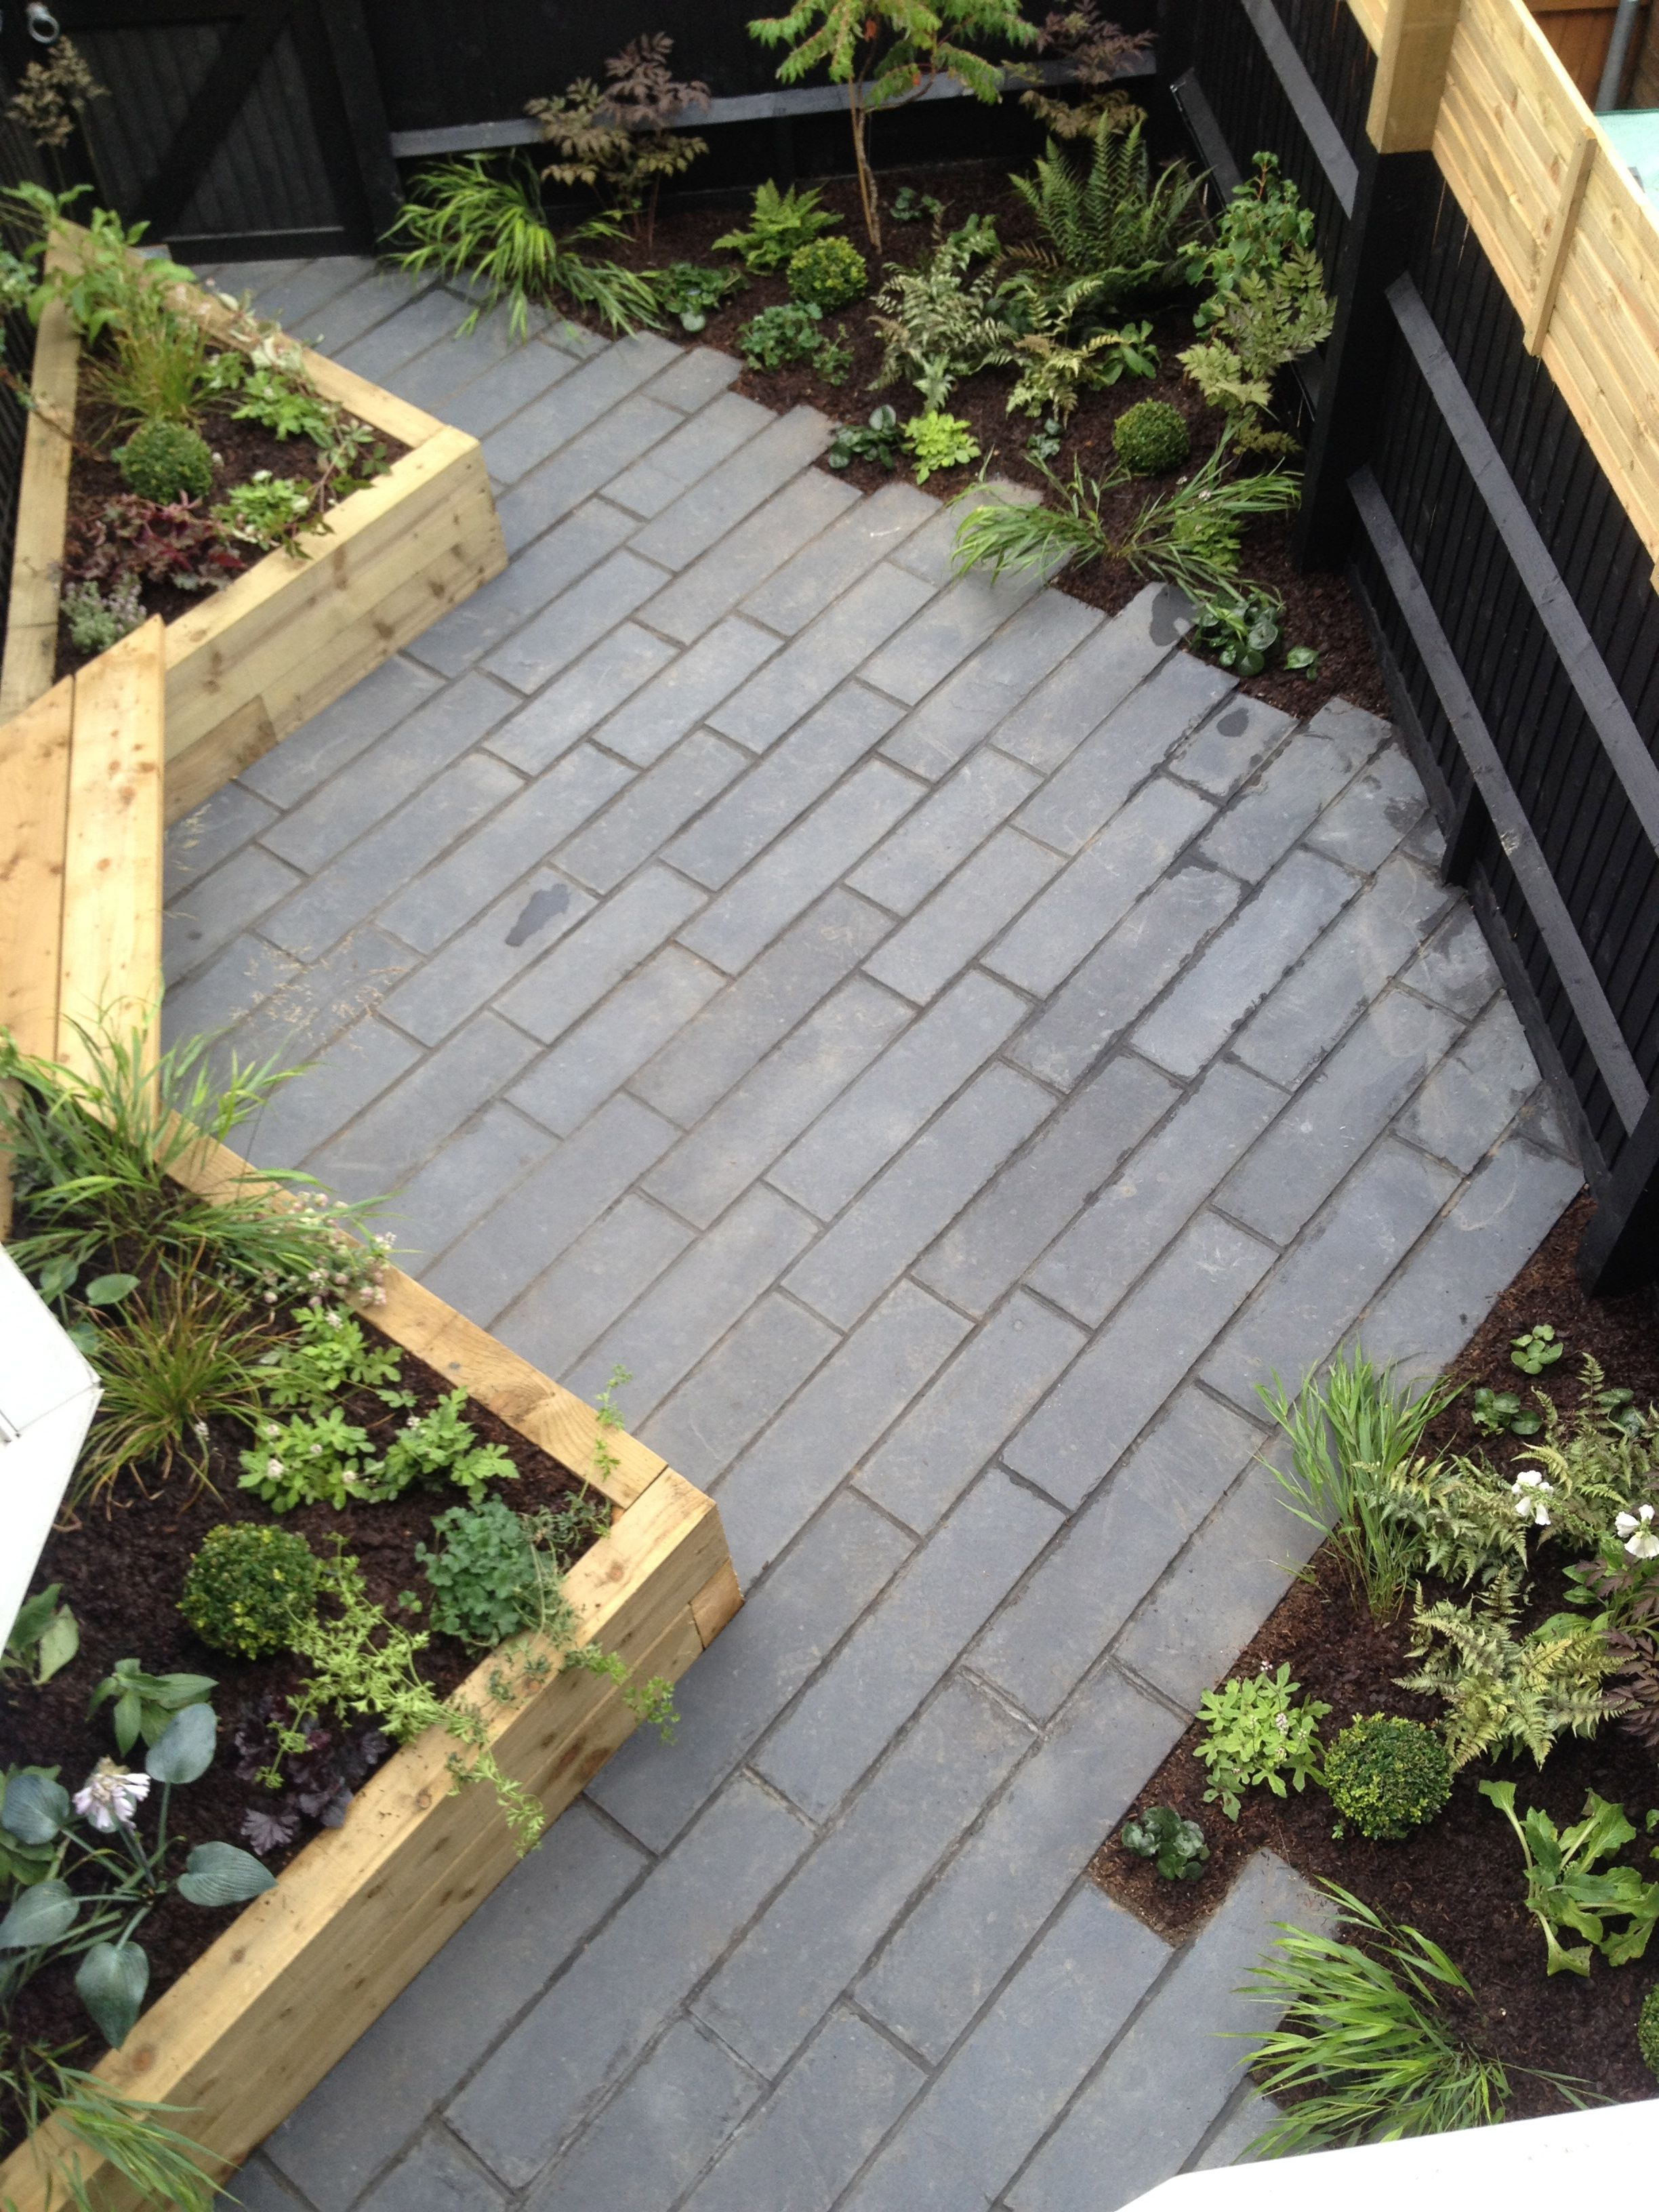 ced black limestone plank paving garden design by johanna. Black Bedroom Furniture Sets. Home Design Ideas